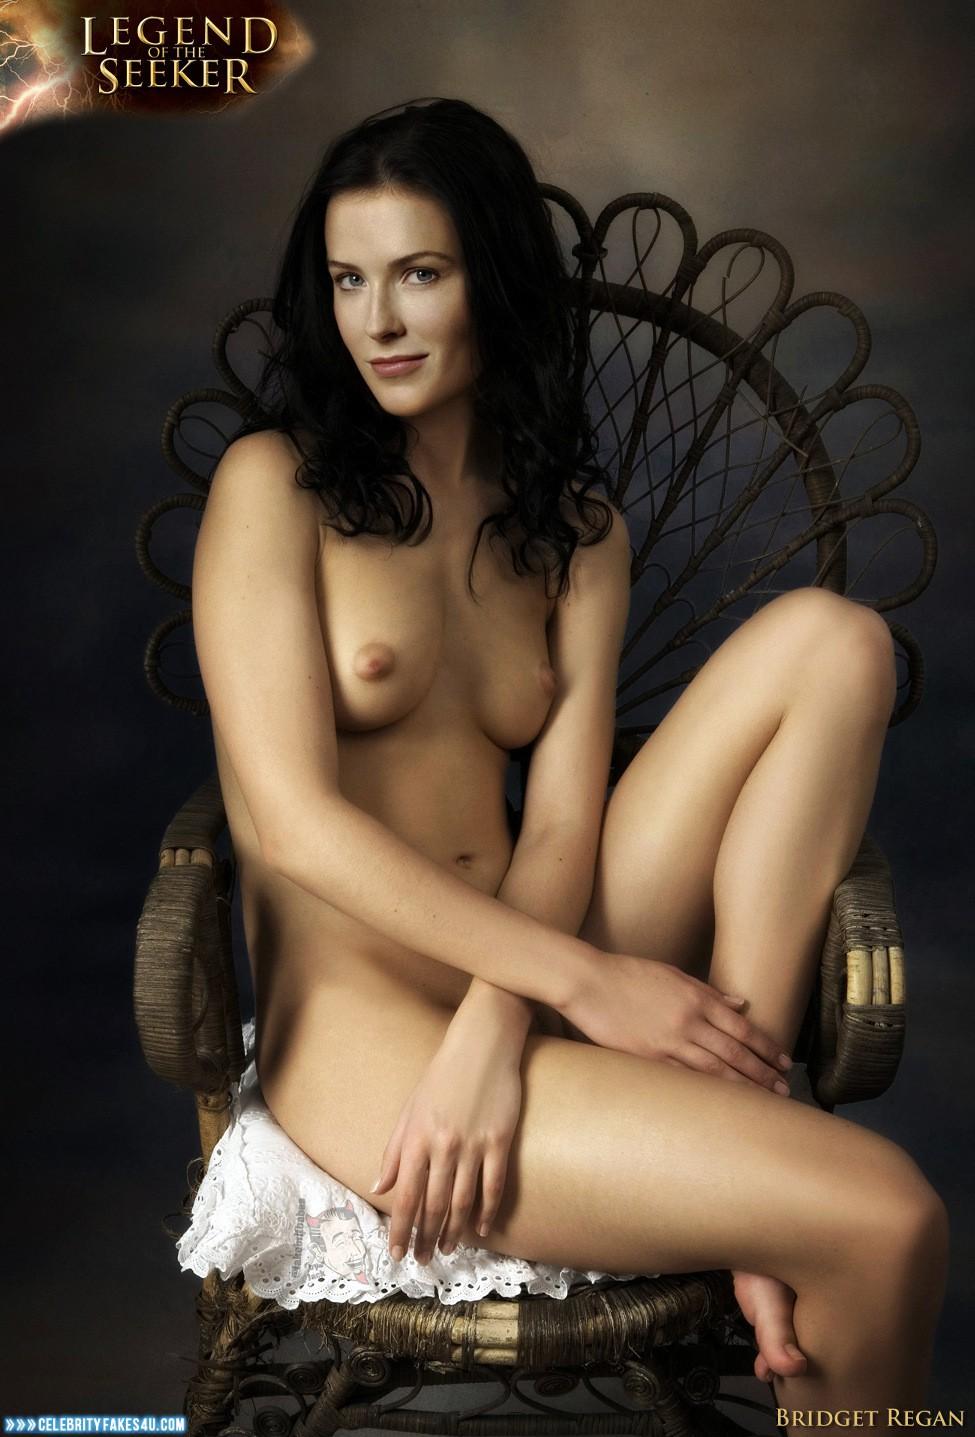 queen latifah dans le porno